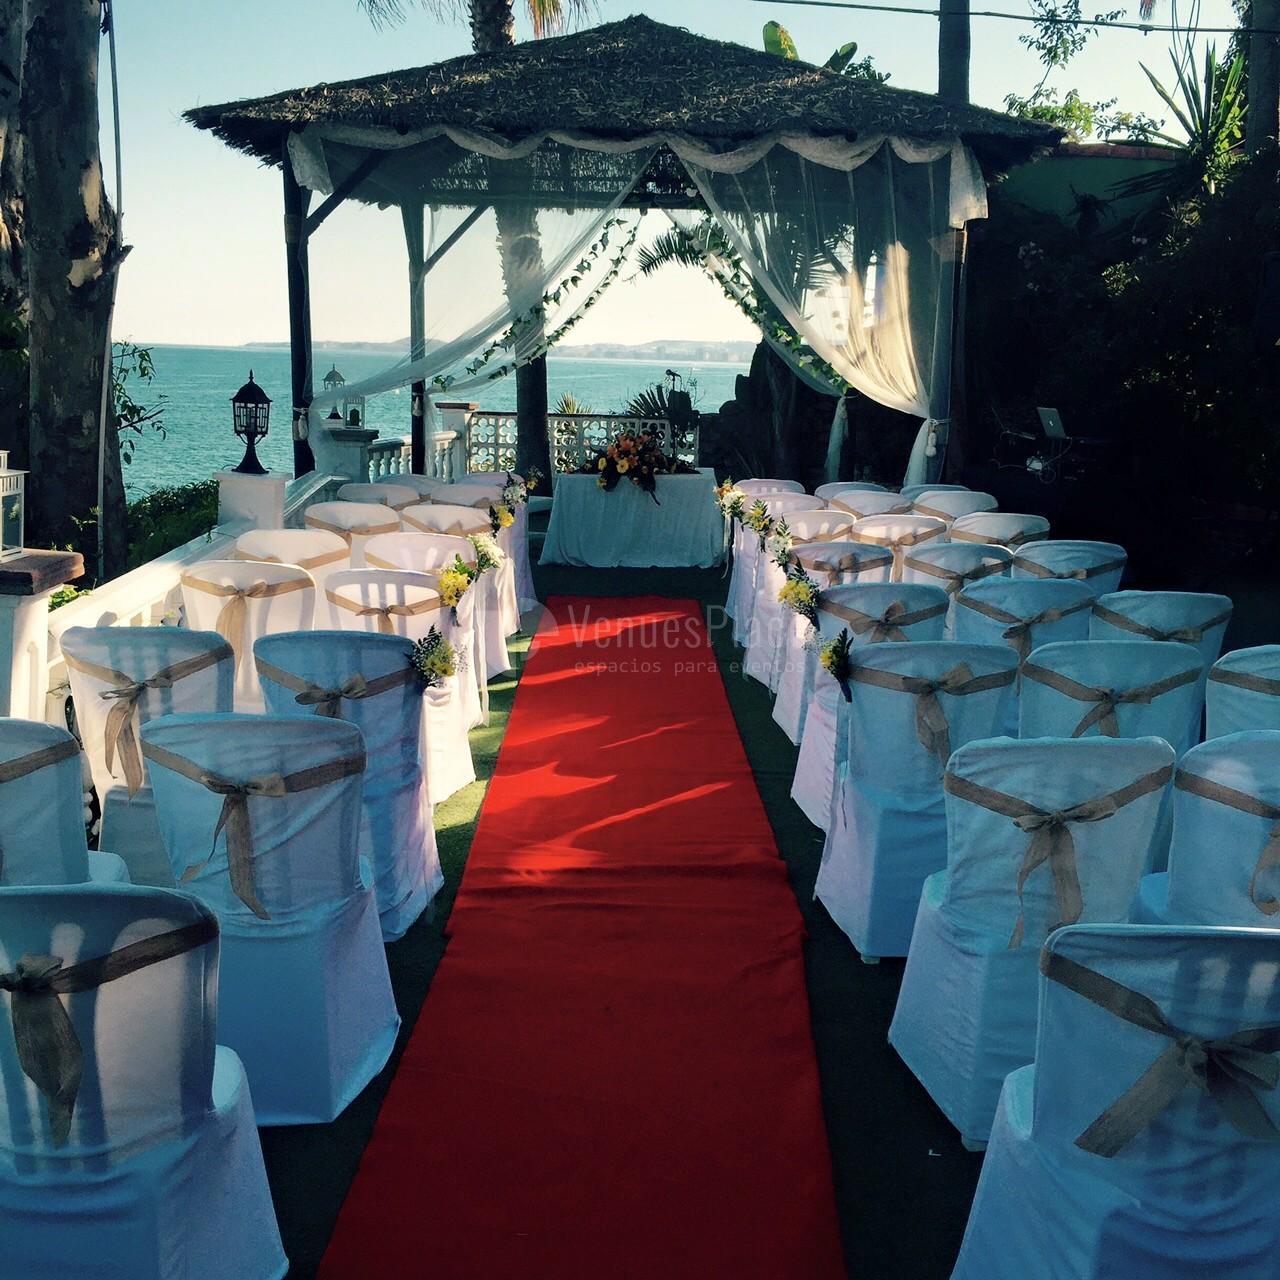 Montaje 2 en Restaurante La Viborilla y Malibu Beach club